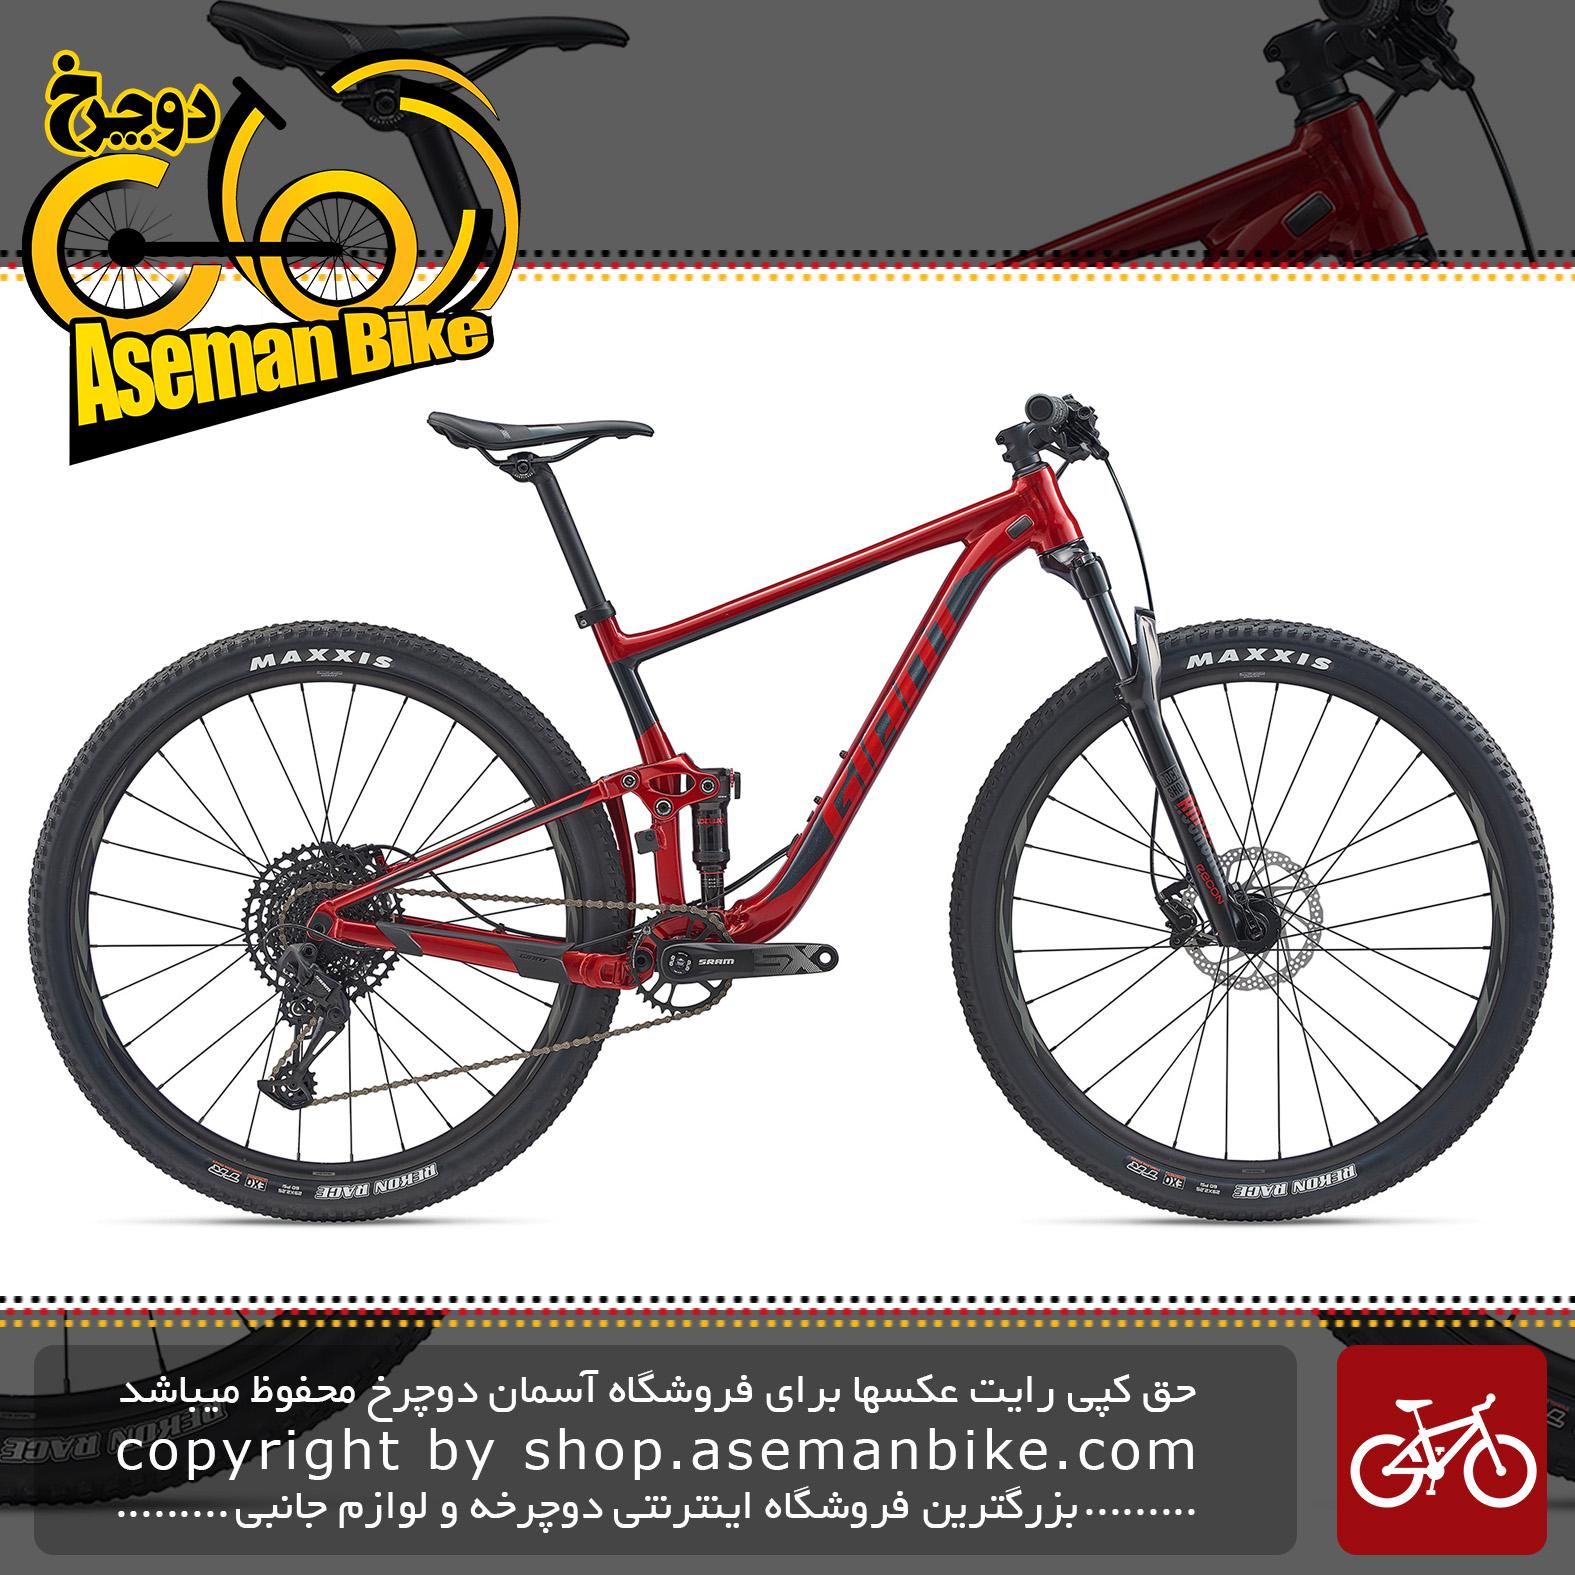 دوچرخه کوهستان جاینت مدل انتم 29 اینچ 3 2020 Giant Mountain Bicycle Anthem 29 3 2020